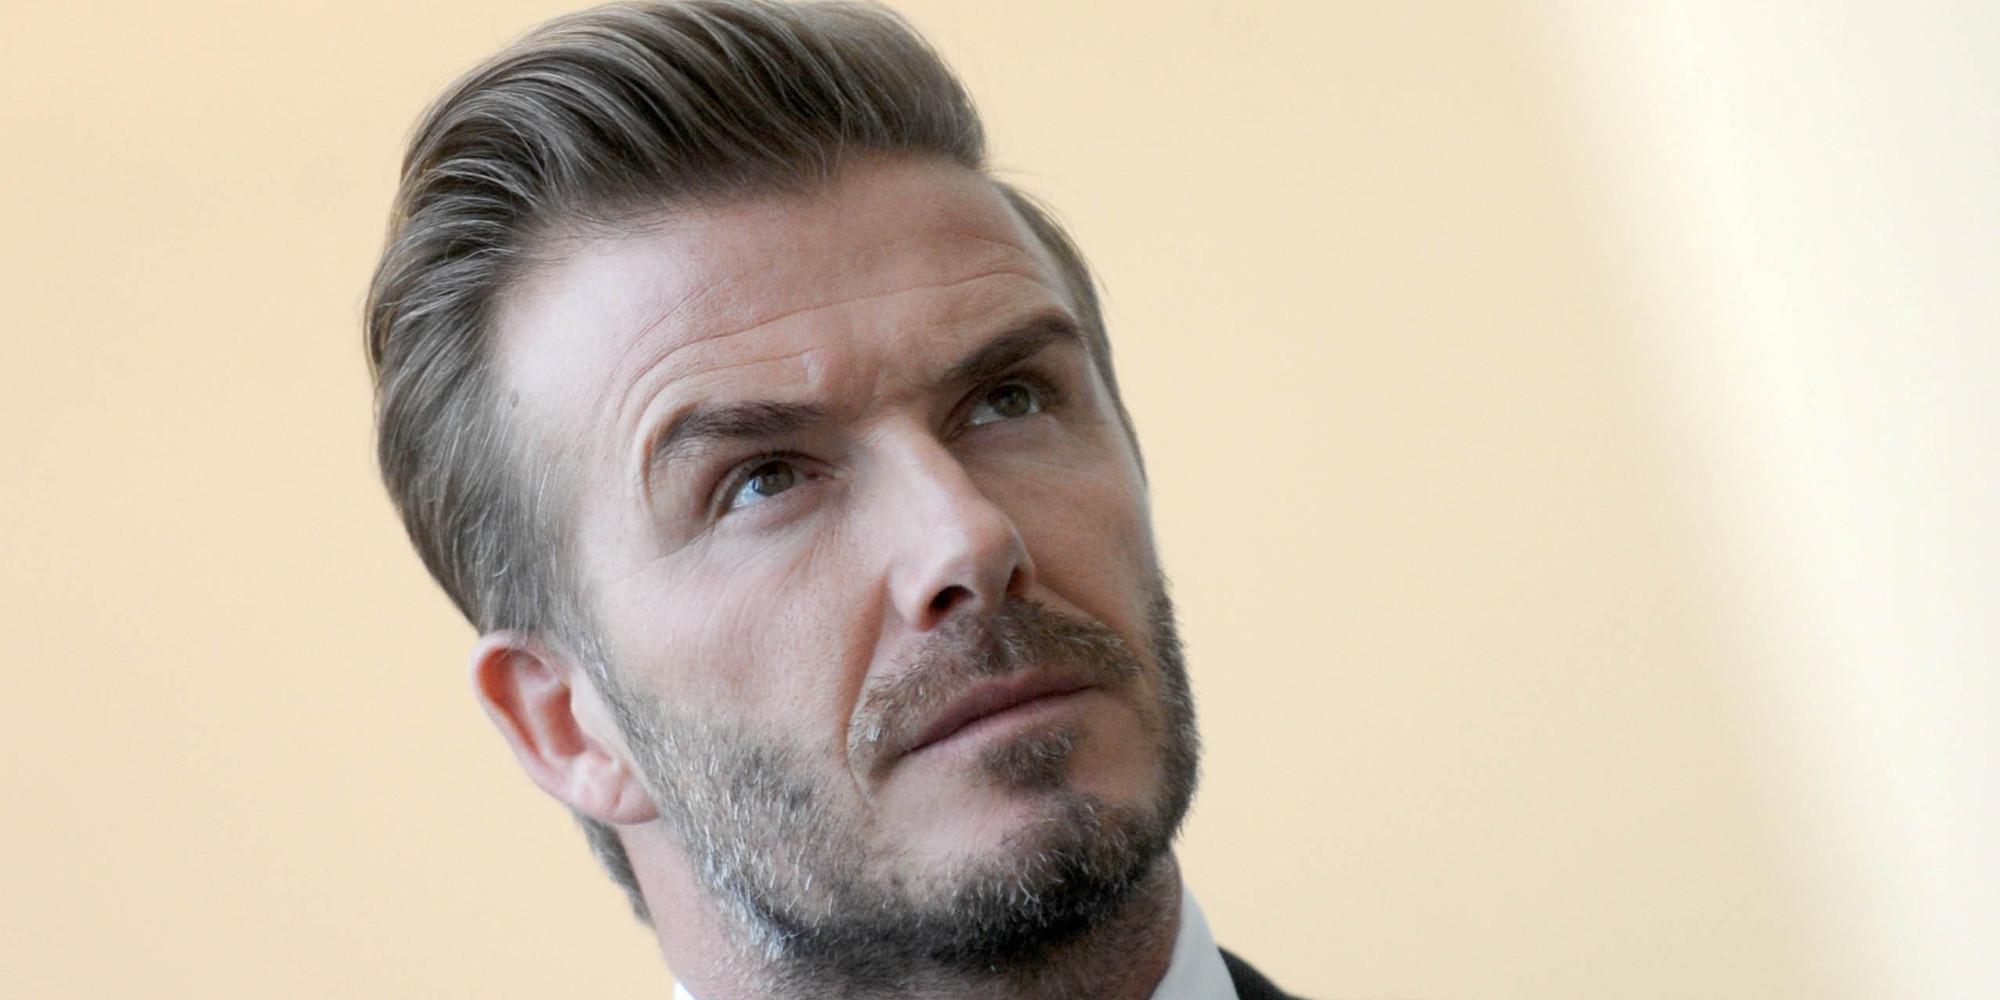 David Beckham's Phone Systematically Hacked, Ex-Newspaper ... David Beckham Facebook